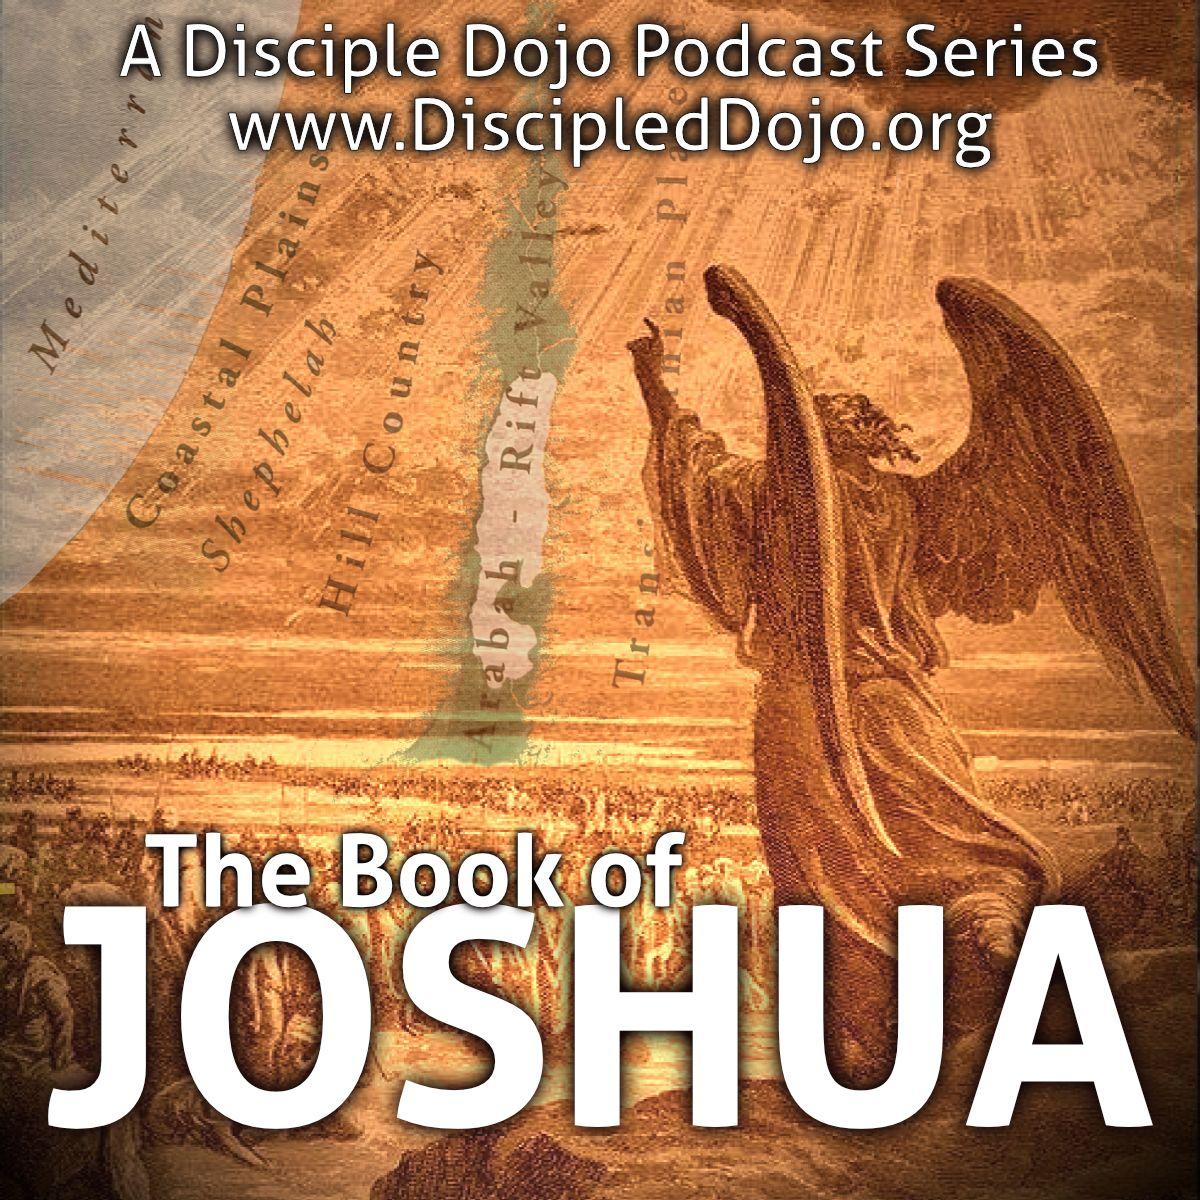 Joshua 4 - YHWH > Baal - Disciple Dojo | Lyssna här